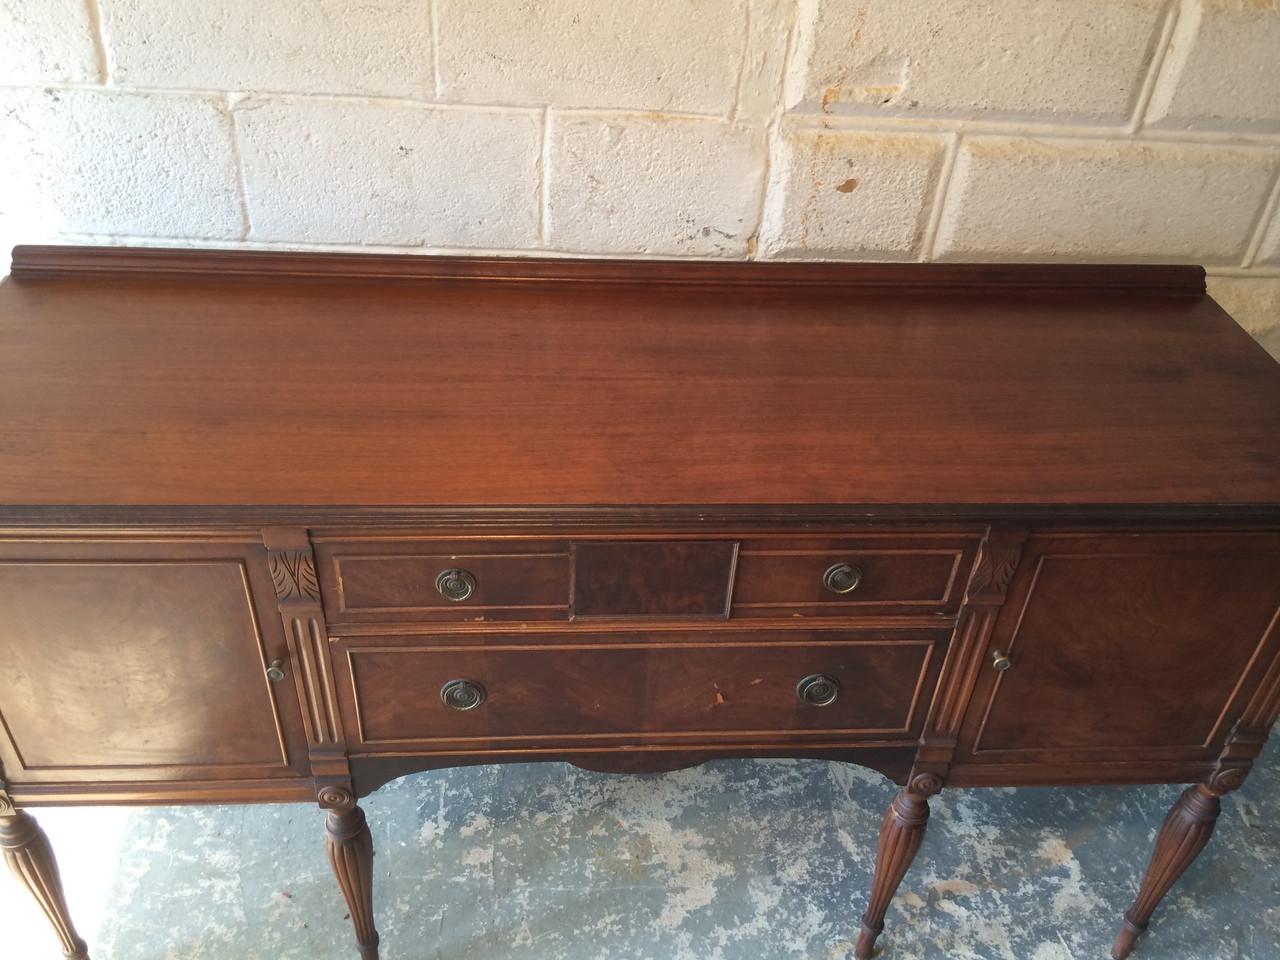 Antique Mahogany Dining Room Sideboard Buffet Forgotten Furniture